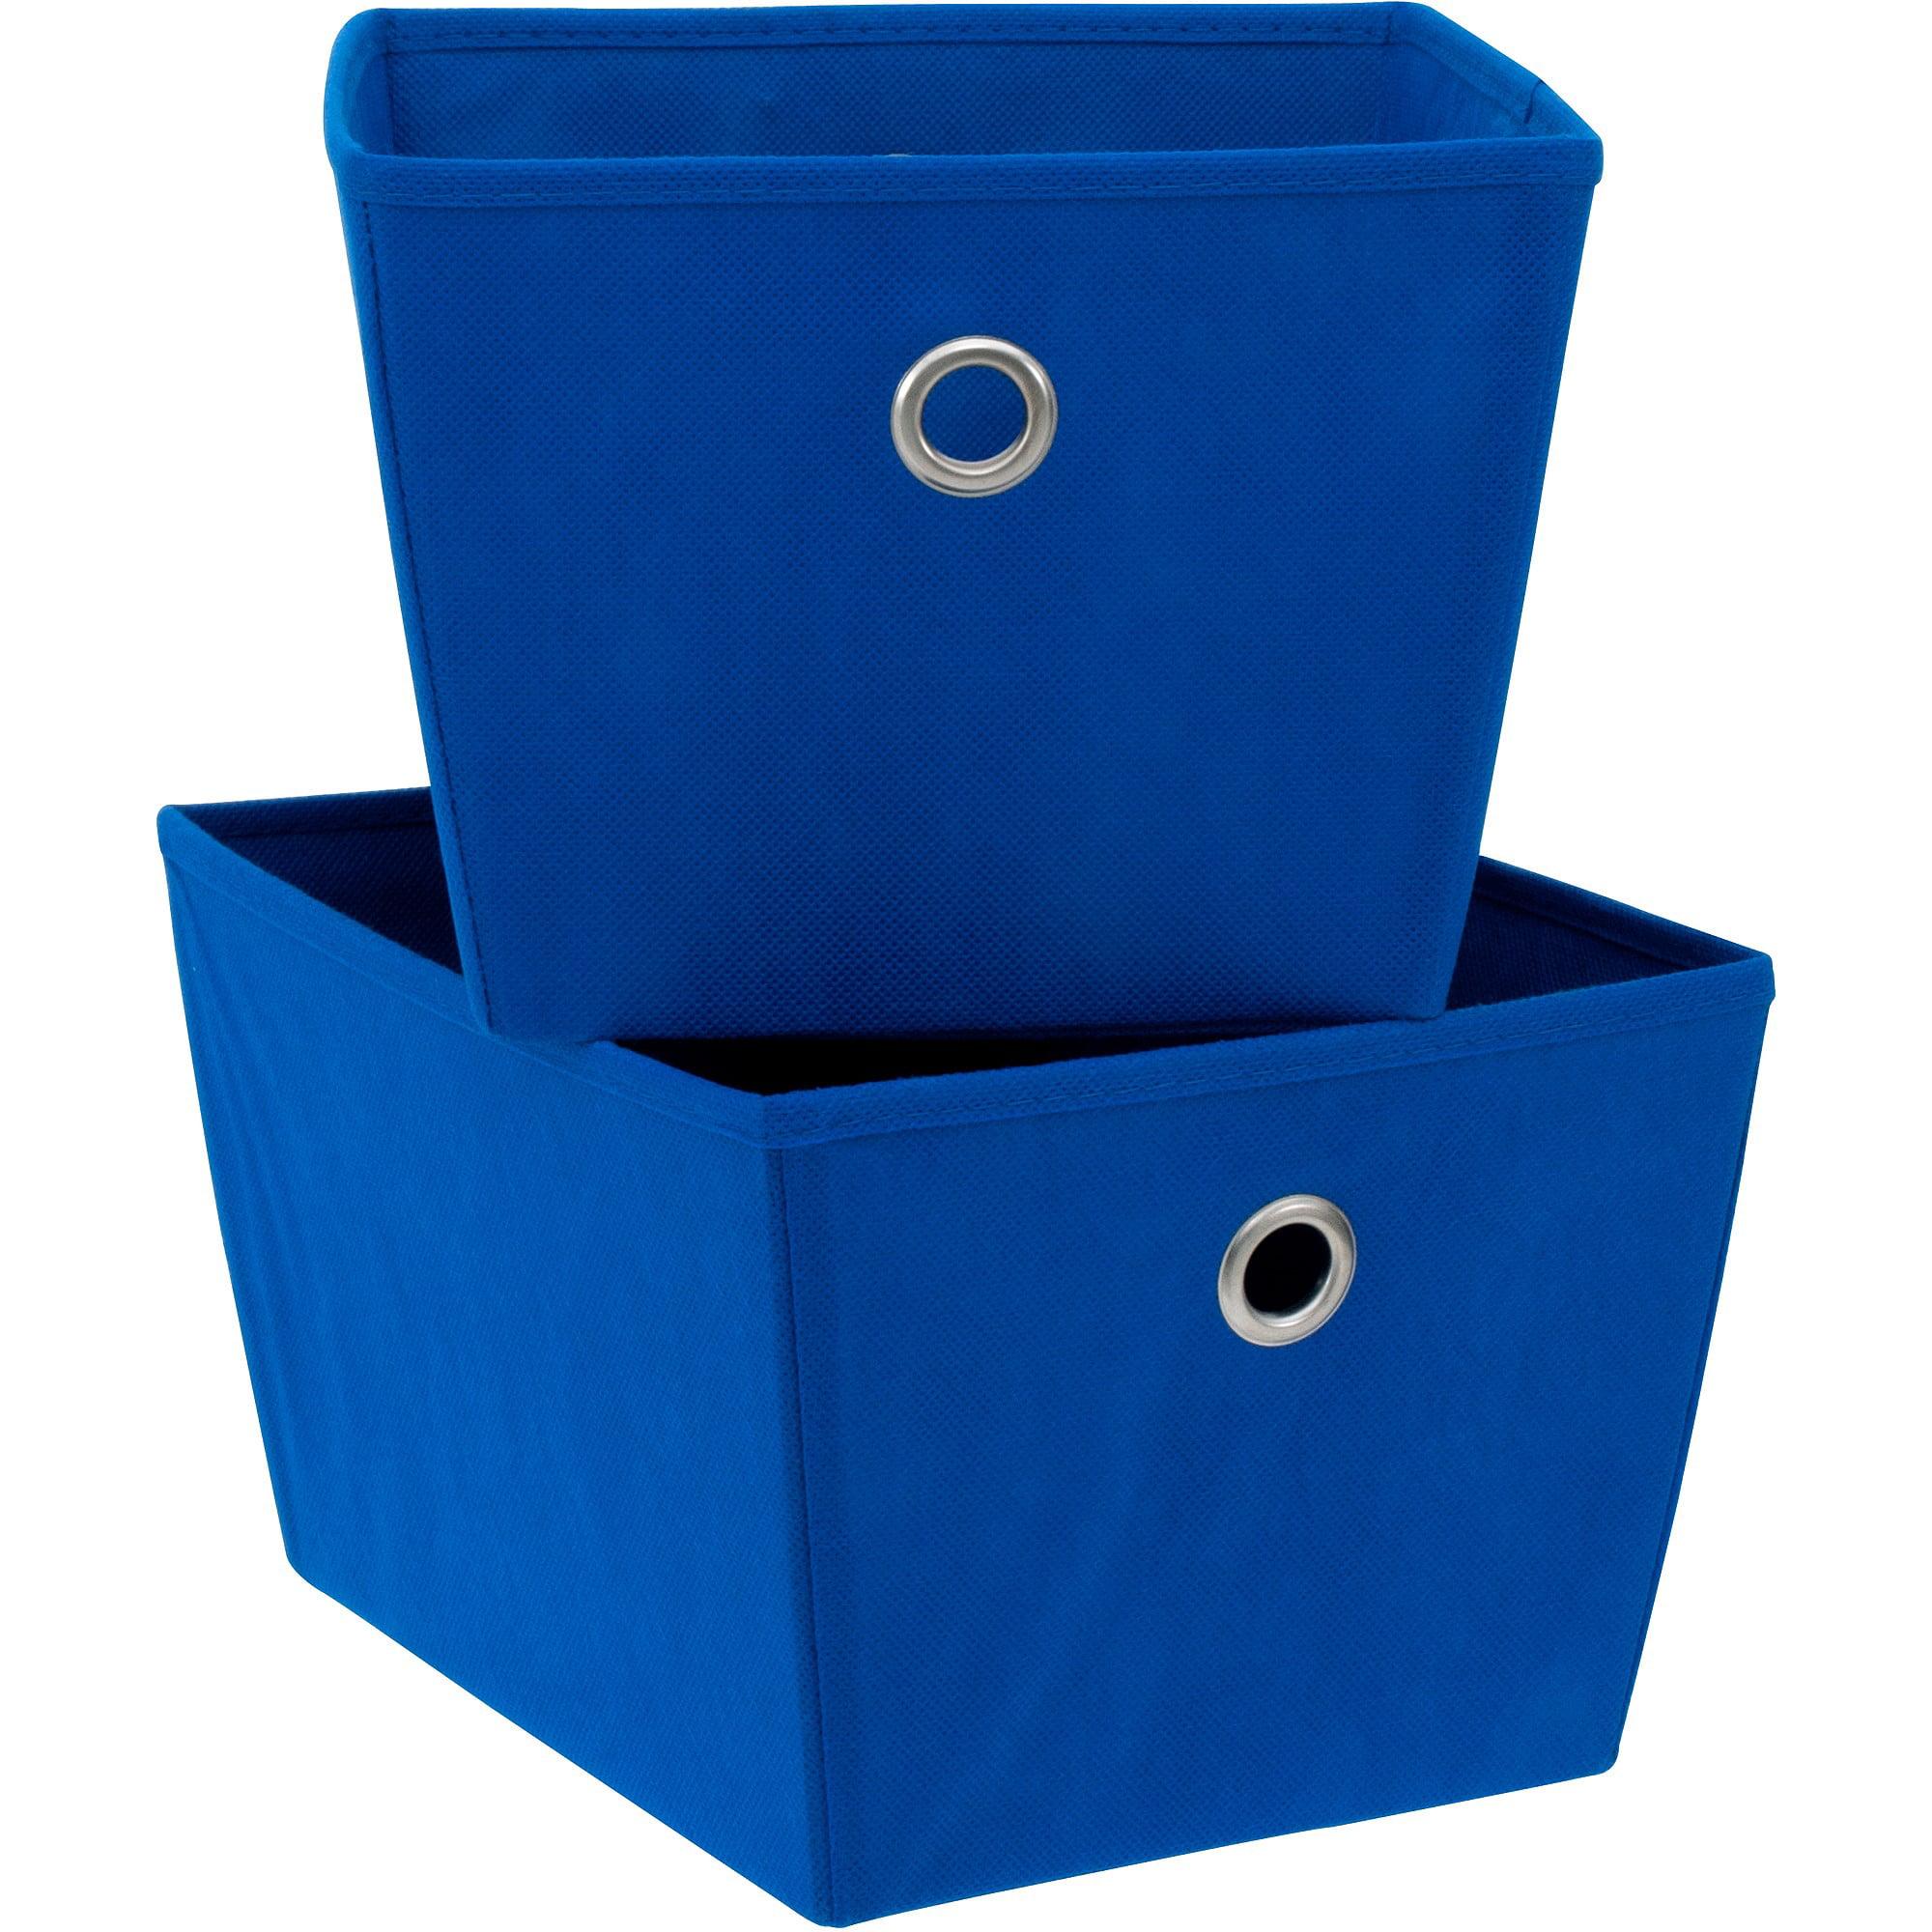 Mainstays Medium Bins 3 Pack-Blue Morpho